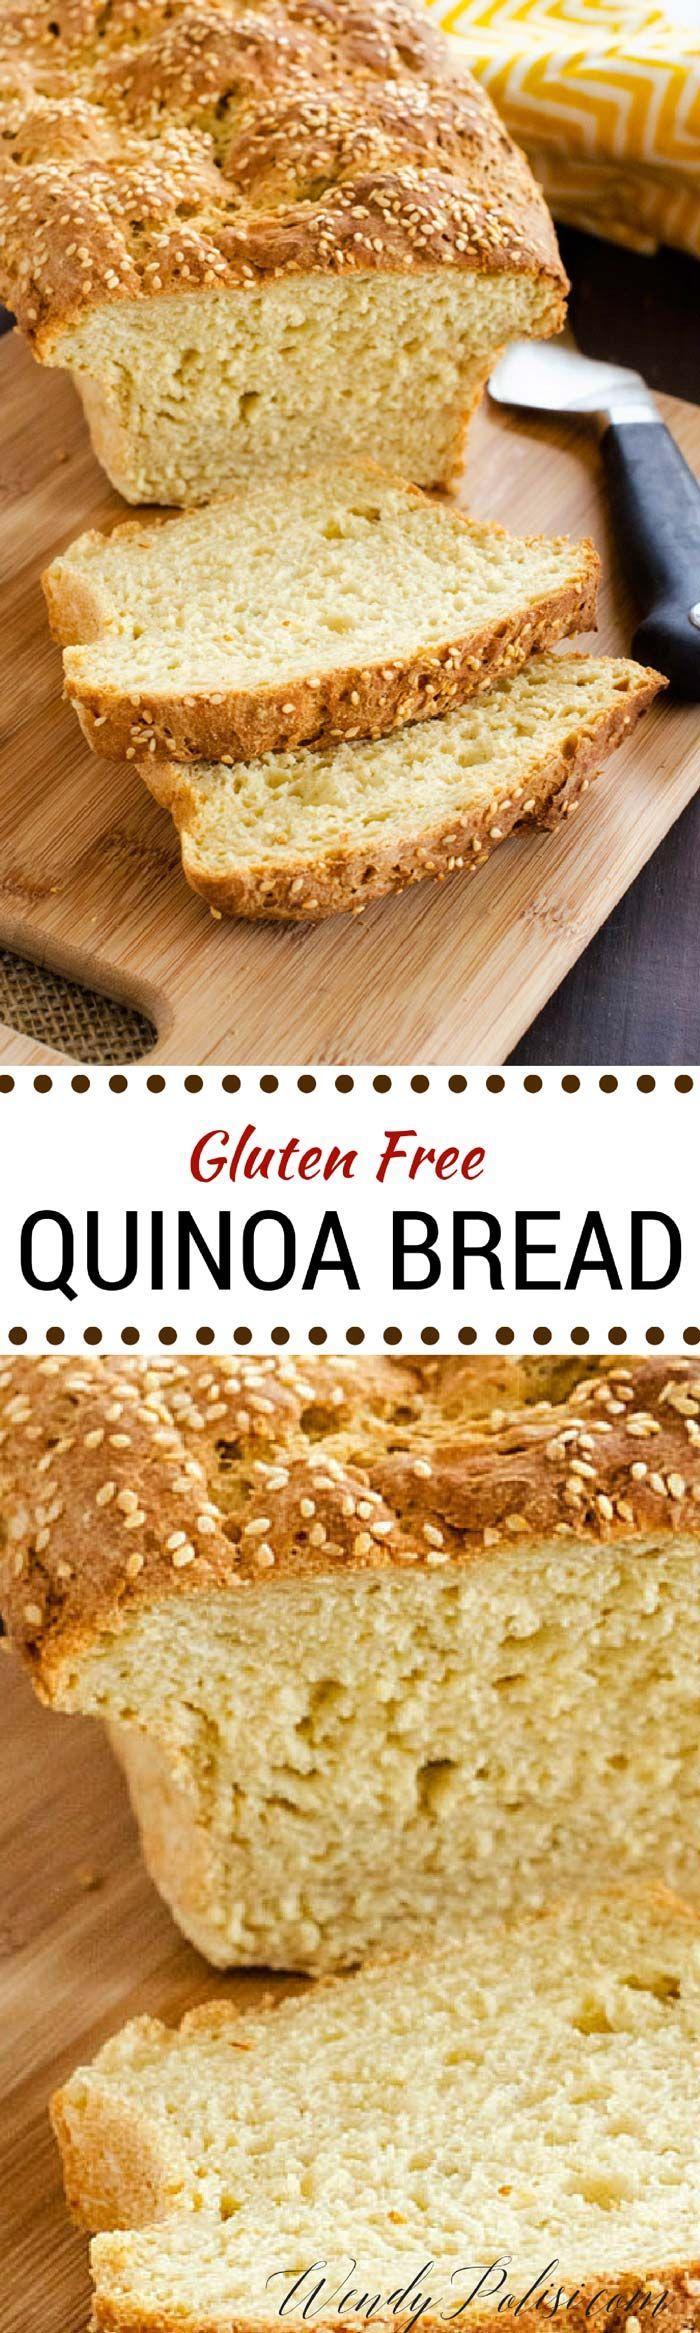 Gluten Free Quinoa Bread via @wendypolisi